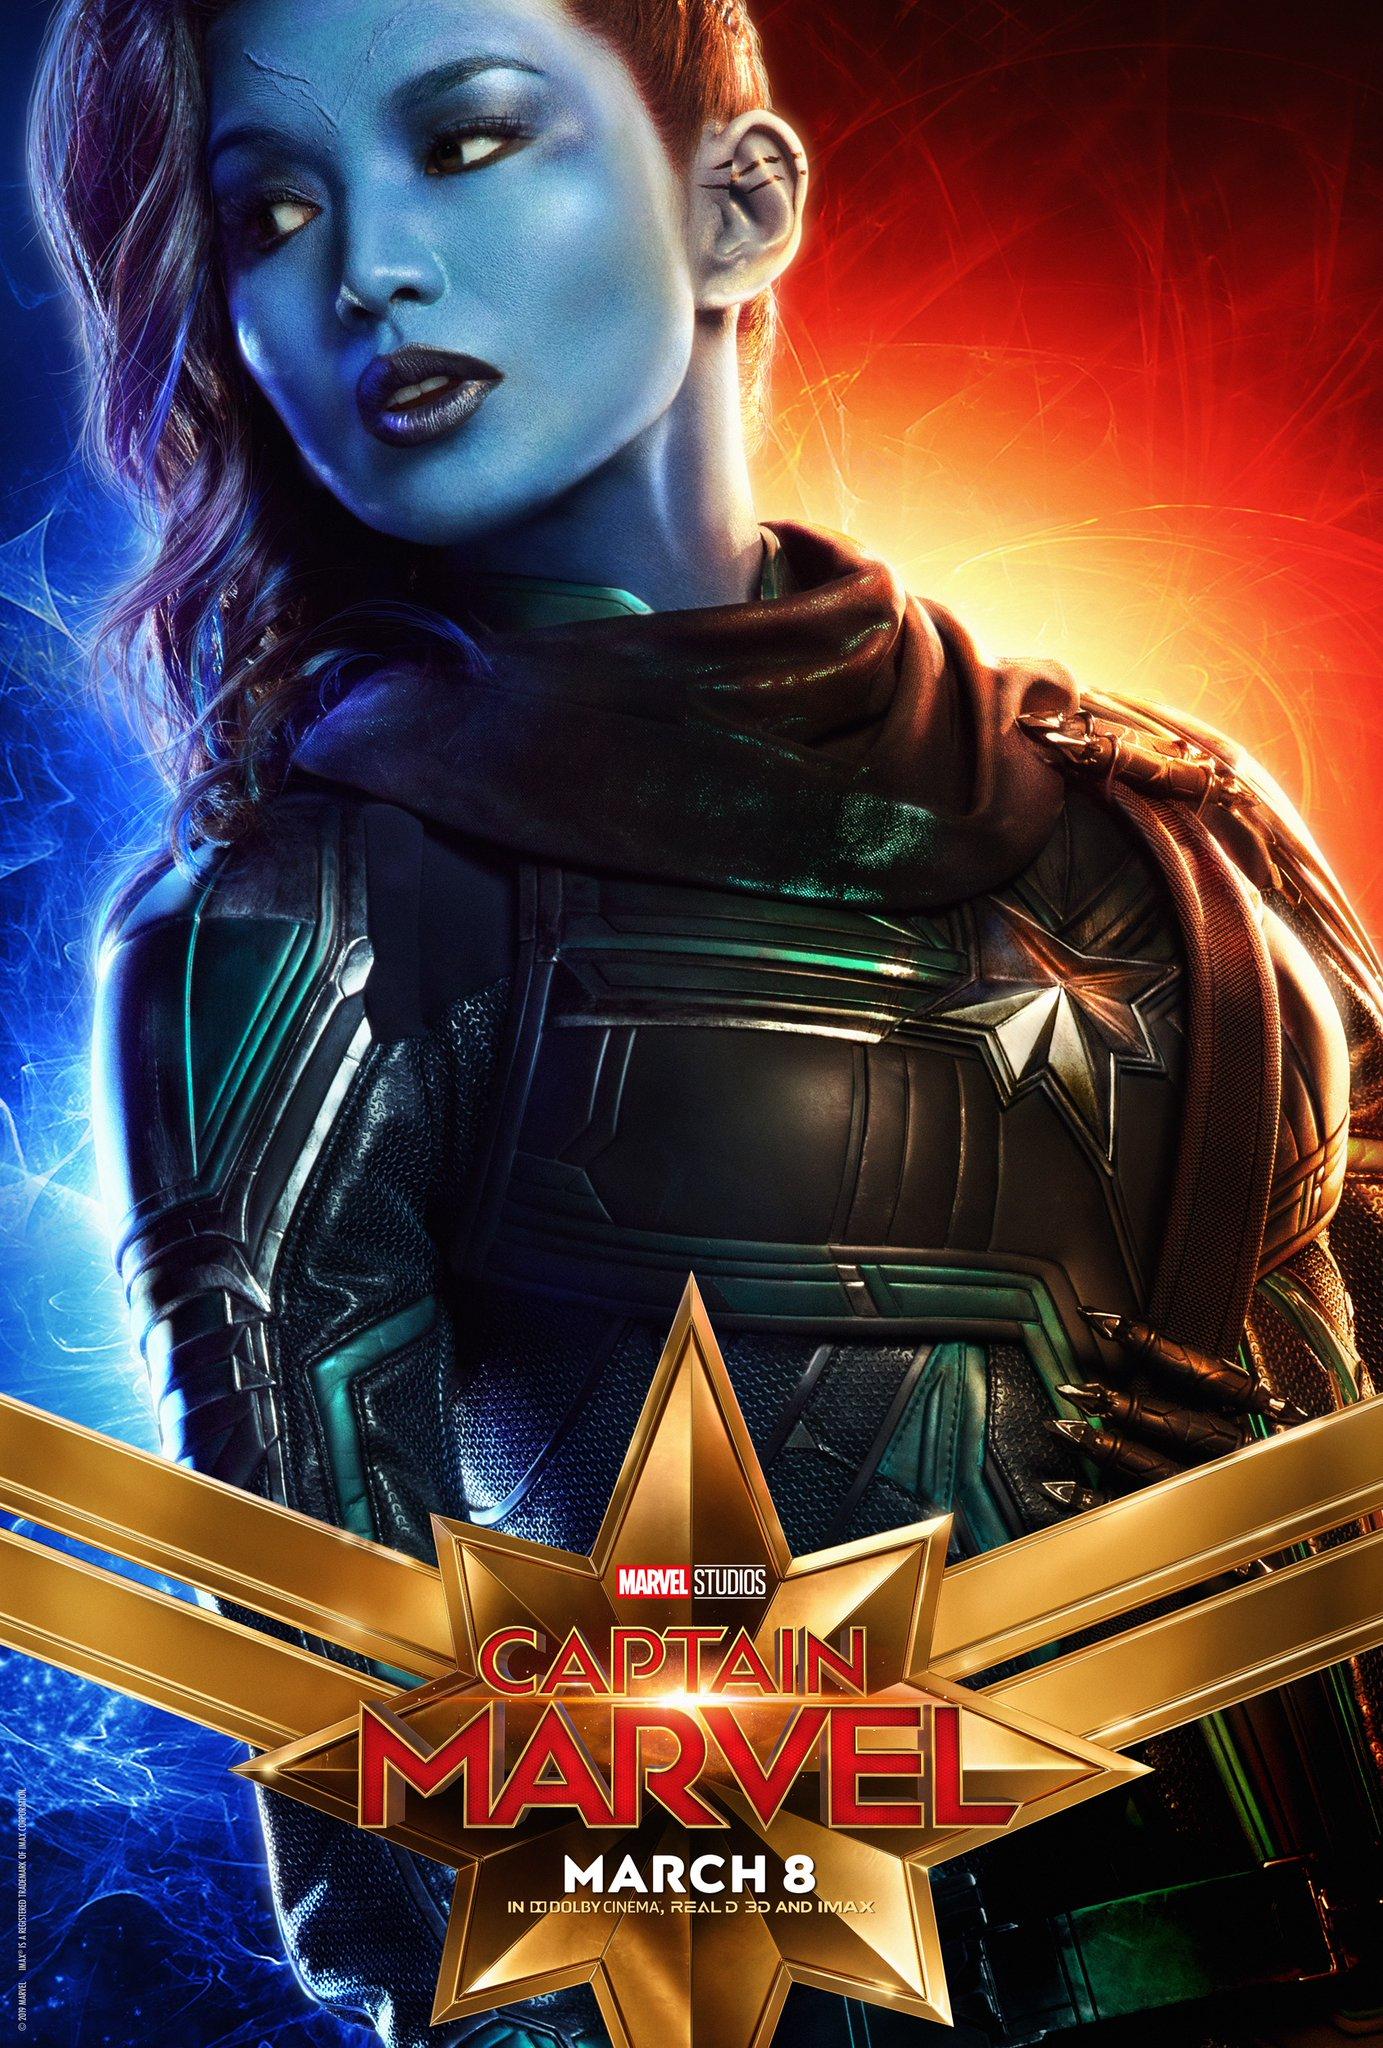 Captain Marvel Character Poster - Gemma Chan Minn-Erva